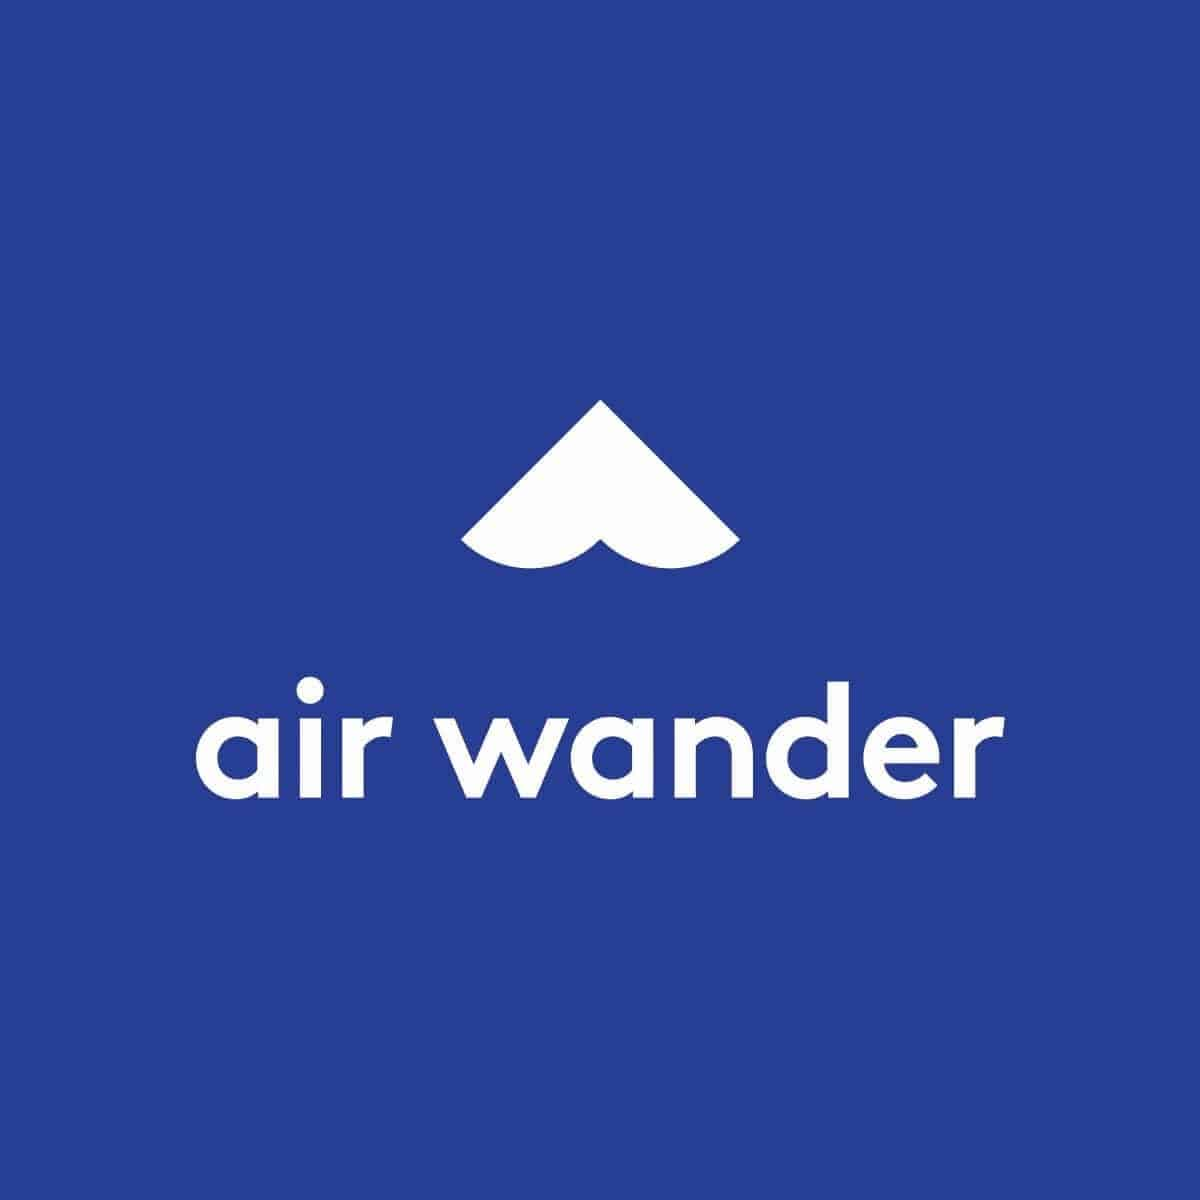 AirWander webs para ahorrar en viajes